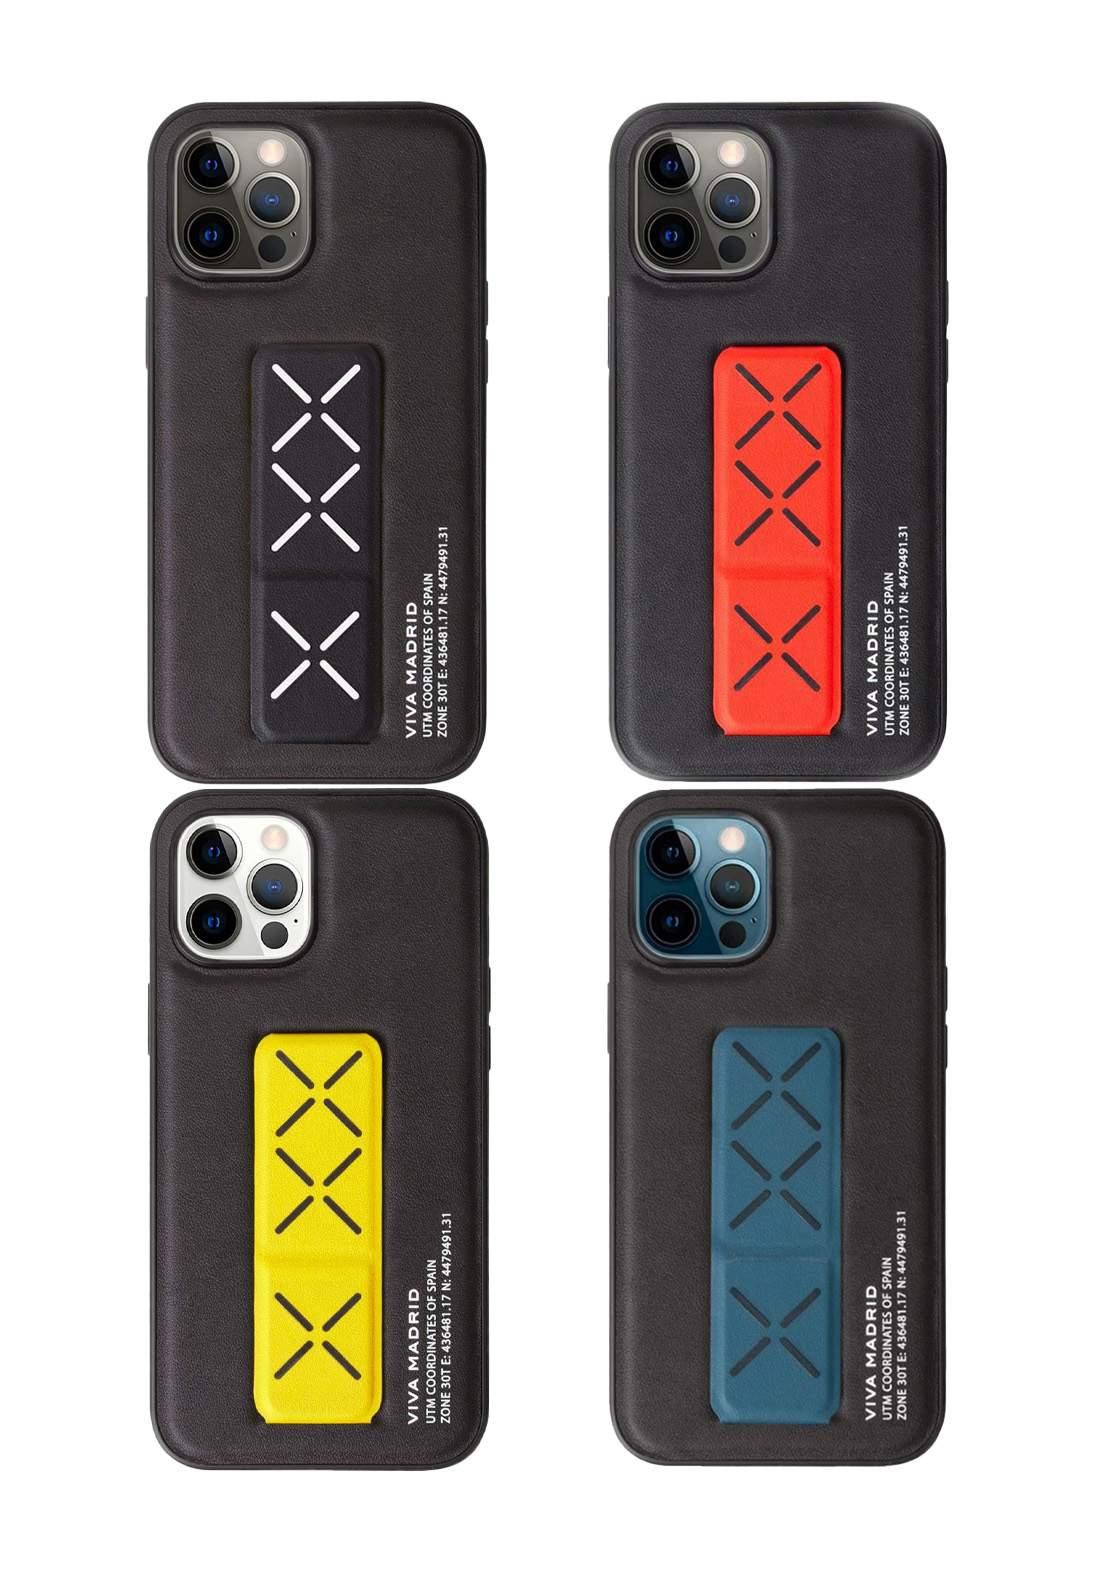 Viva Madrid Finura Case for iPhone 12 Pro Max حافظة موبايل